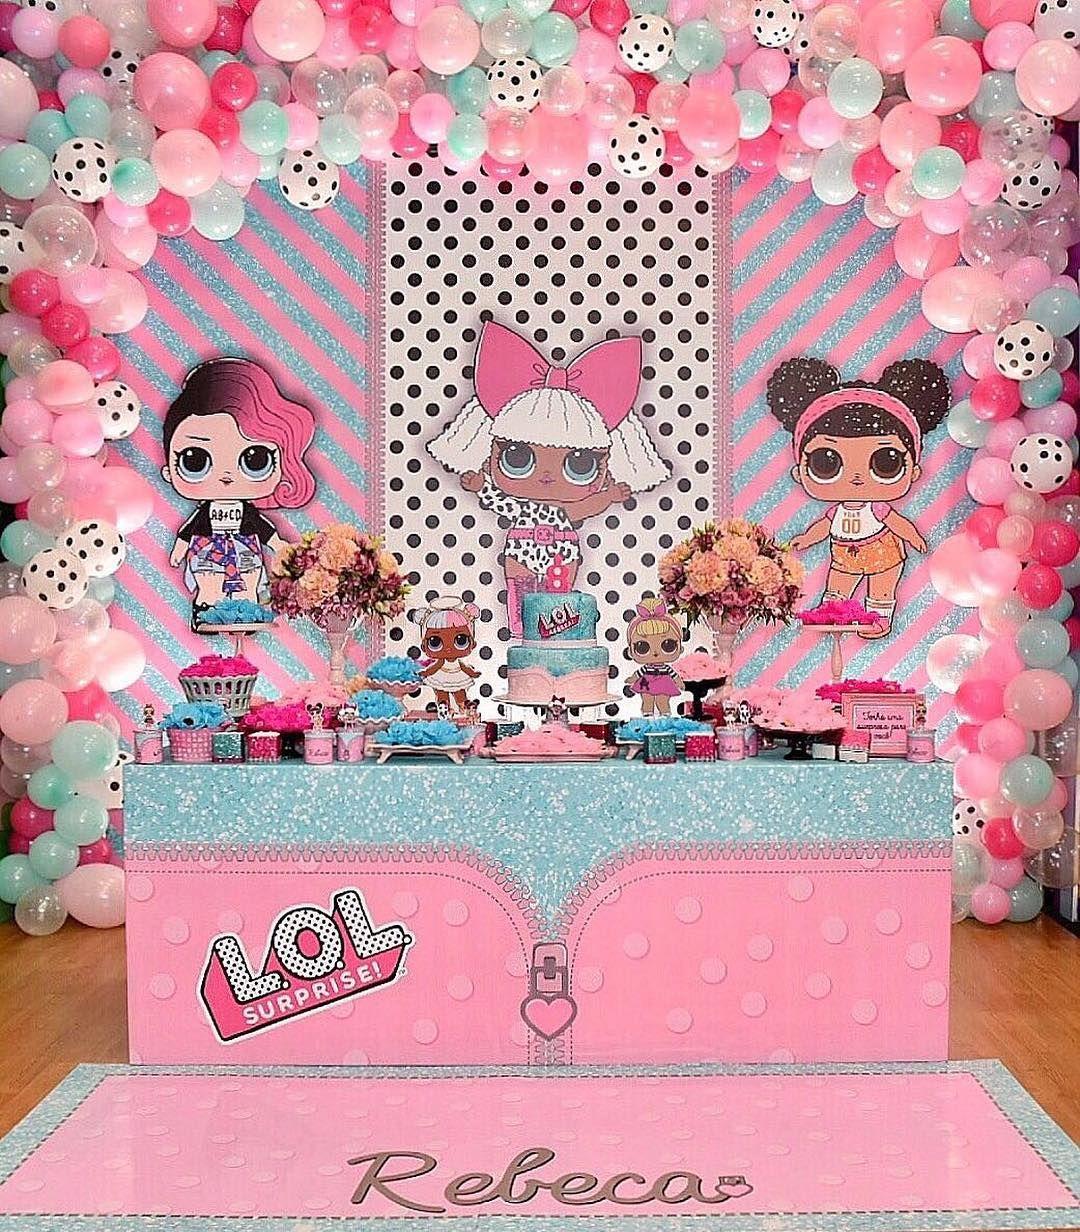 Mesa de postres para fiesta nina tema munecas lol 5 cumplea os mu ecas lol doll party lol Fiesta sorpresa de cumpleanos para nina